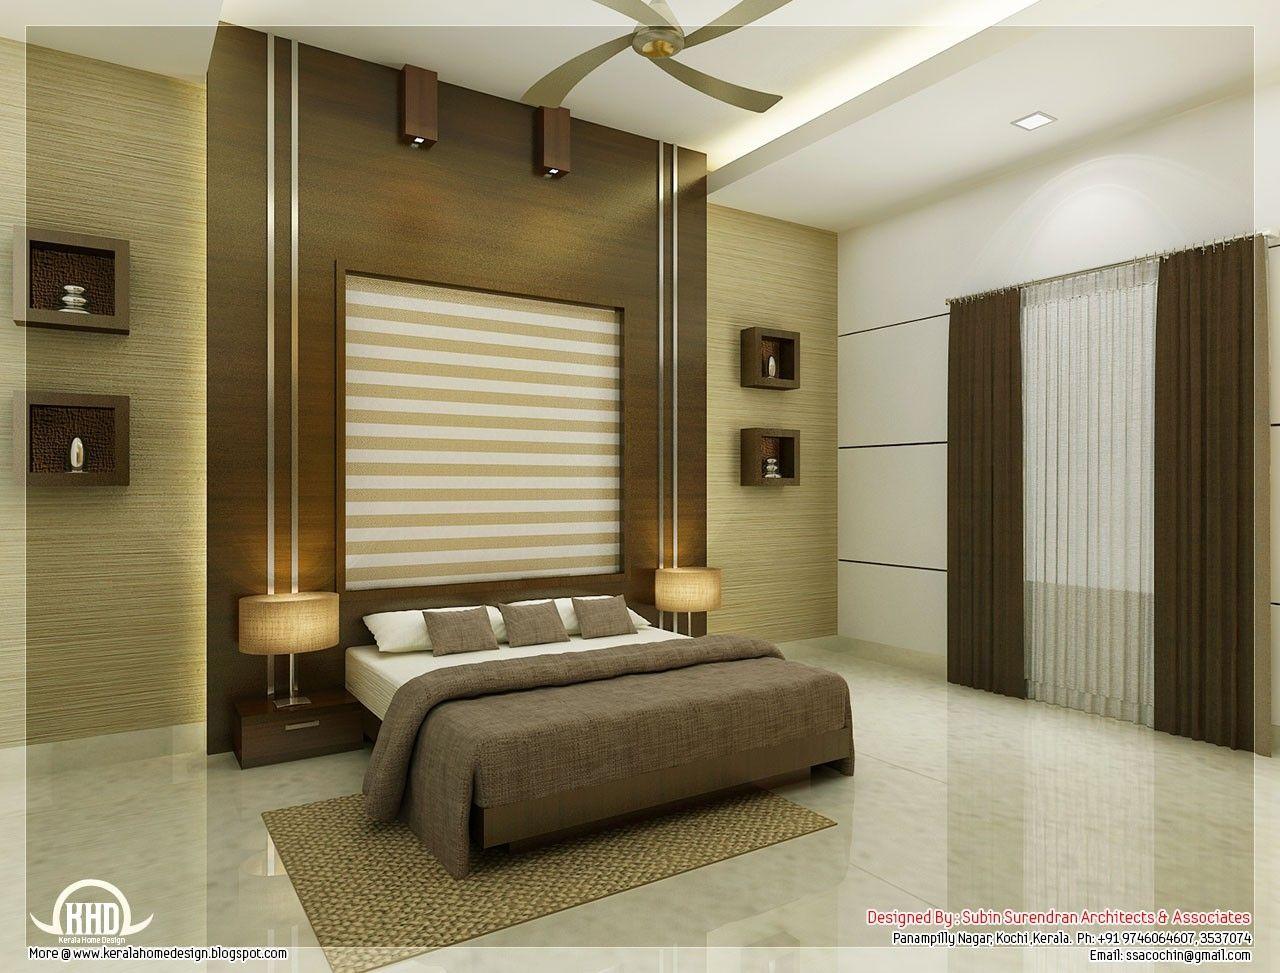 Beautiful Bedroom Interior Designs Kerala Home Design And Floor With Kerala Bedroo Master Bedroom Interior Master Bedroom Interior Design Indian Bedroom Design Beautiful bedroom interior design